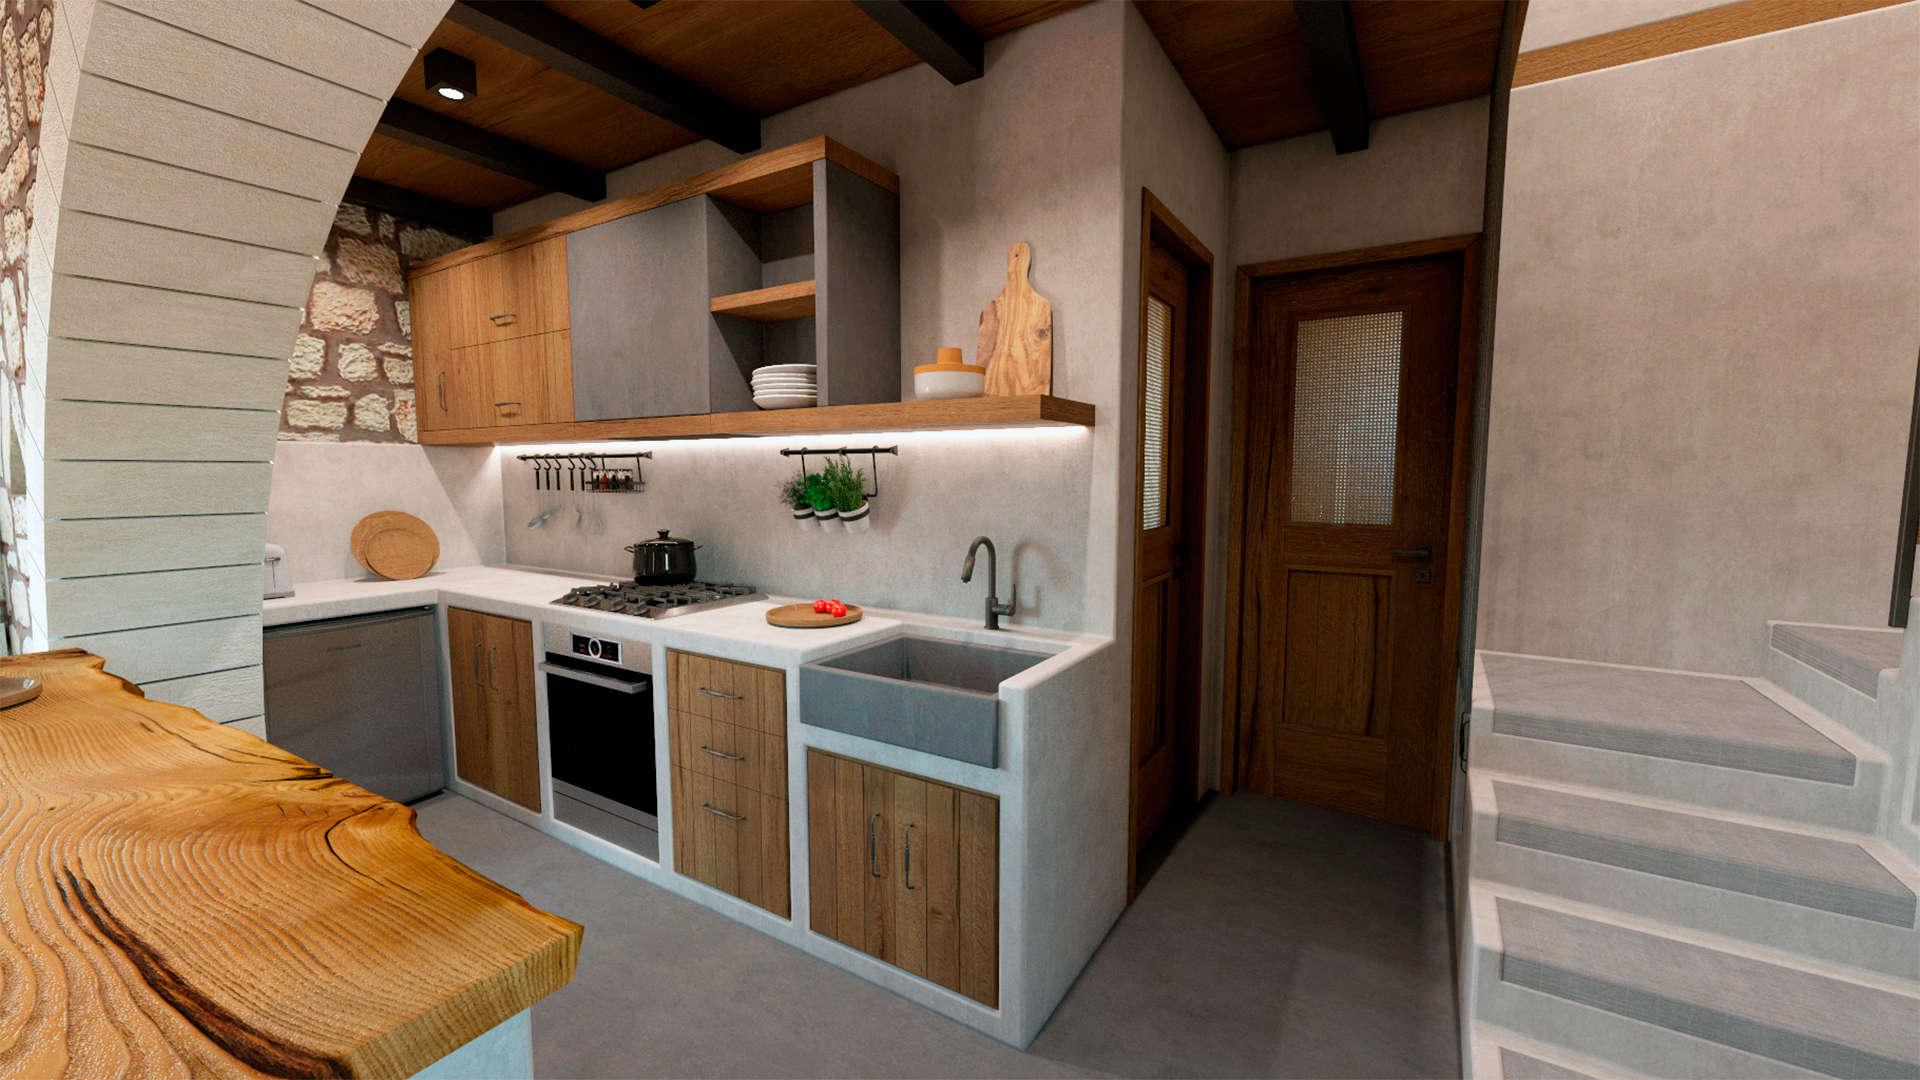 Holiday home, interior design, kitchen, stairs. Παραθεριστική κατοικία, εσωτερικοί χώροι, κουζίνα, σκάλα.